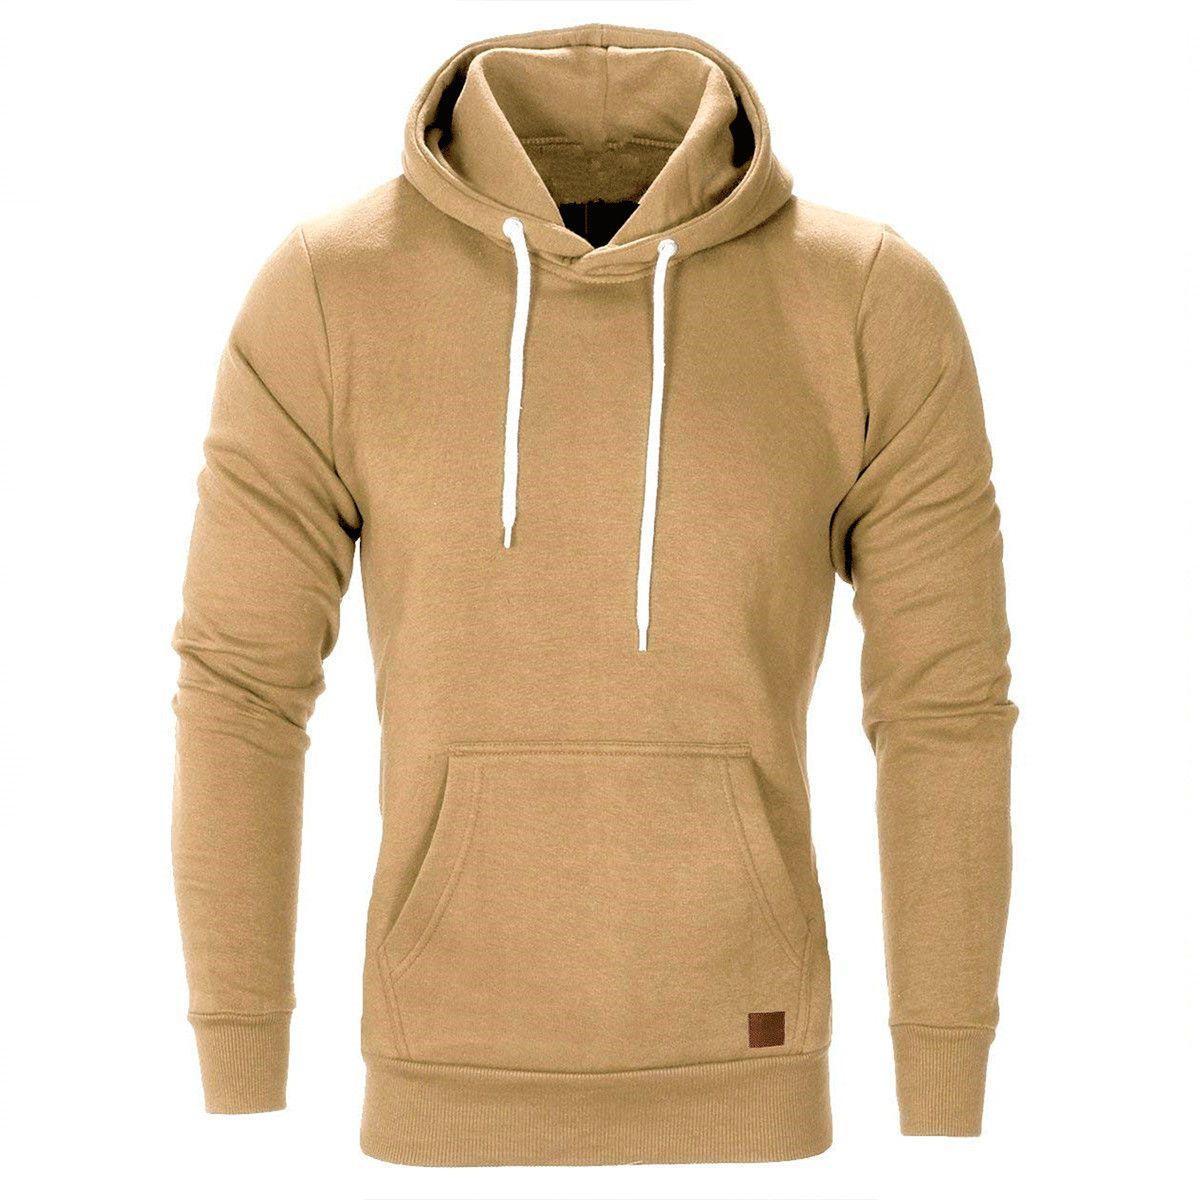 Men S Winter Hoodies Slim Fit Hooded Sweatshirt Outwear Sweater Warm Coat Jacket Hoodies Men Style Hoodies Men Hooded Sweatshirt Men [ 1200 x 1200 Pixel ]